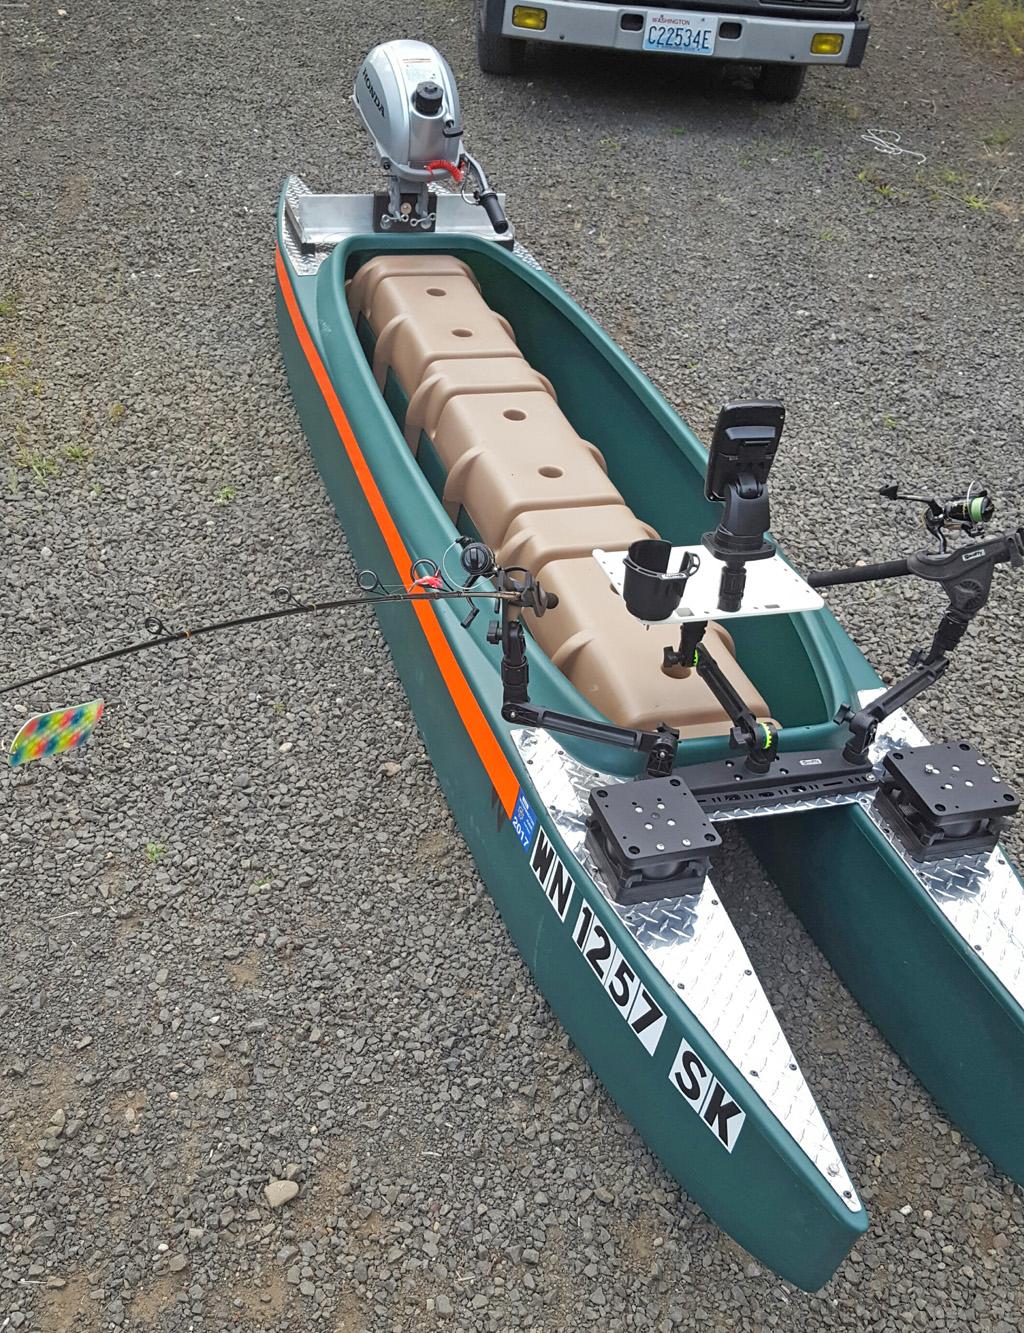 Wavewalk-700-with-2.3HP-Honda-outboard-motor-1024